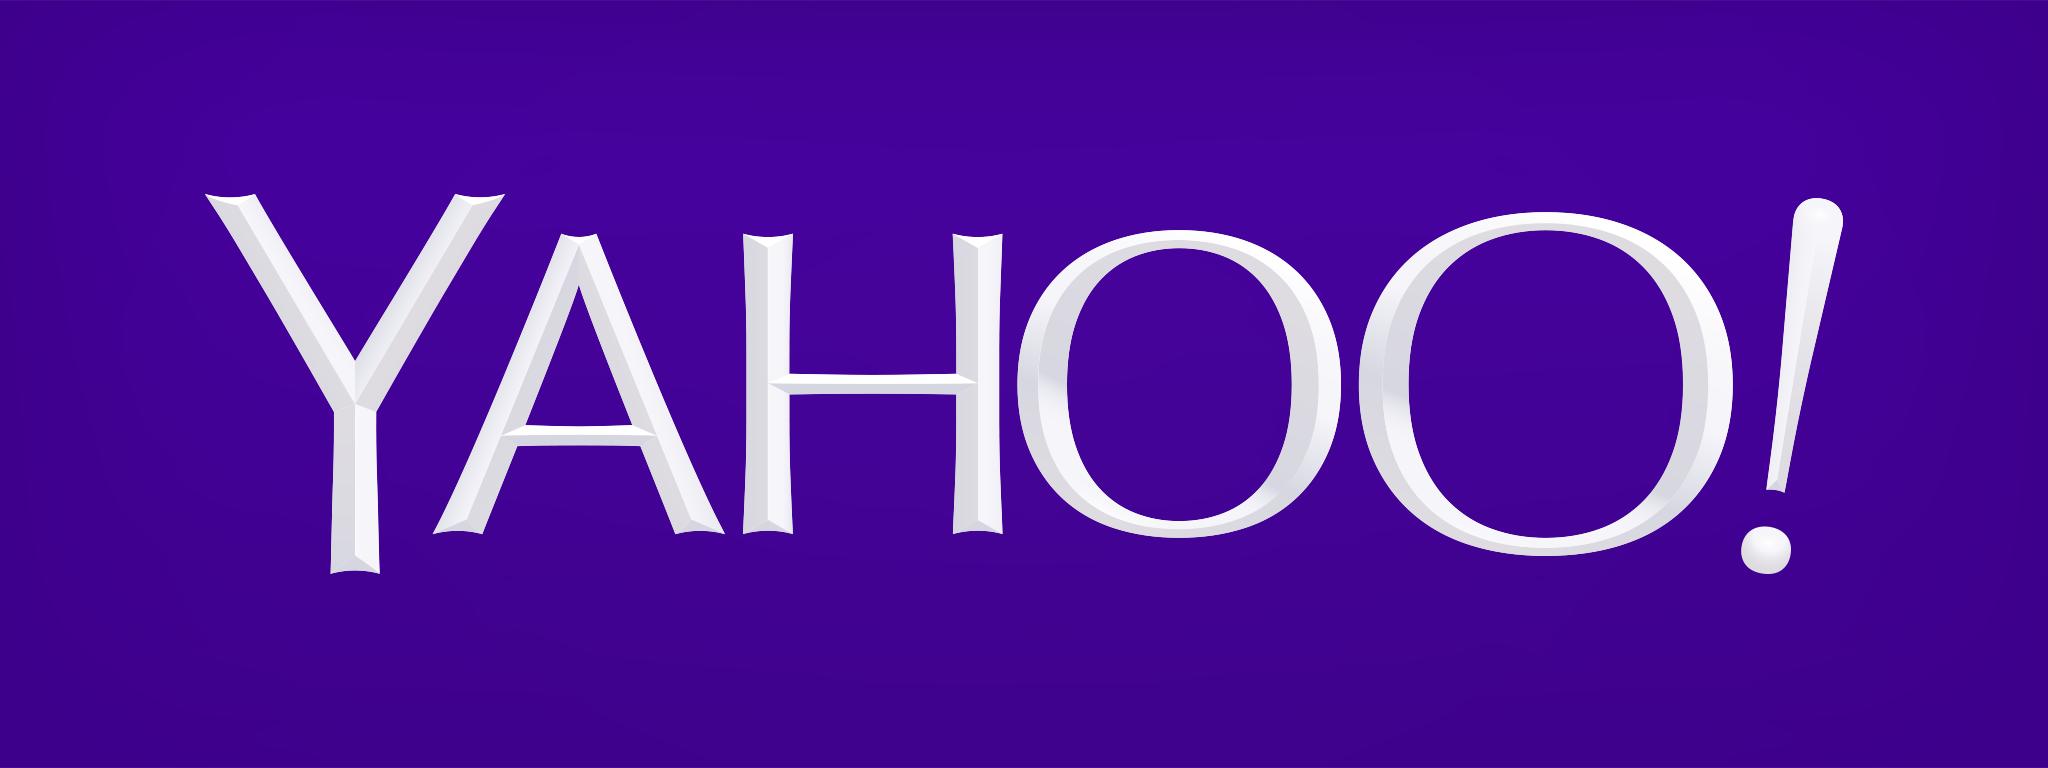 Yahoo Old Logo Vector PNG - 40108